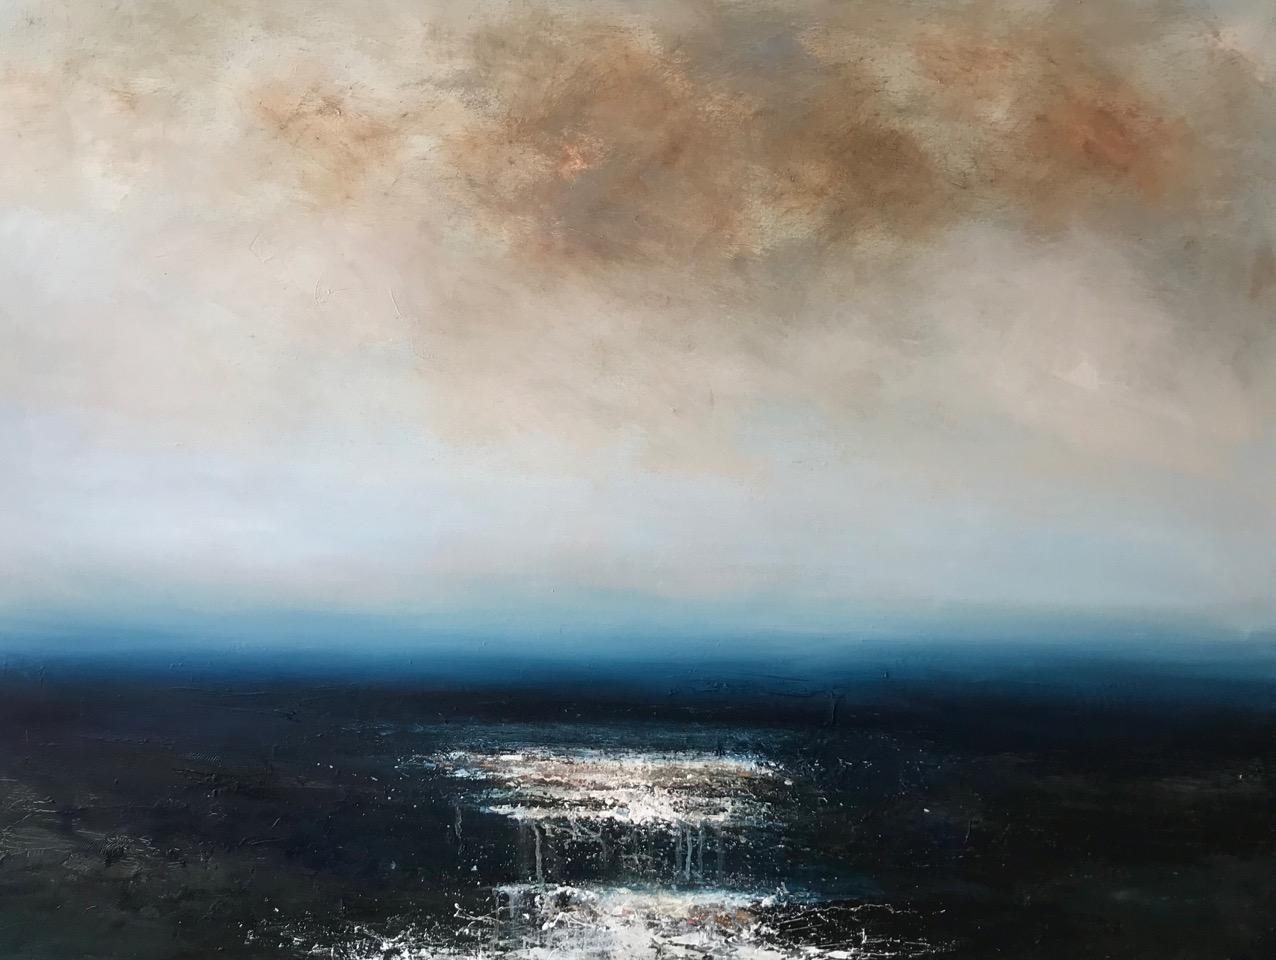 Artist: Hannah Ludnow  Title: Embark  Size: 90 x 120 cm  Medium: Oil on canvas  Price: £1600